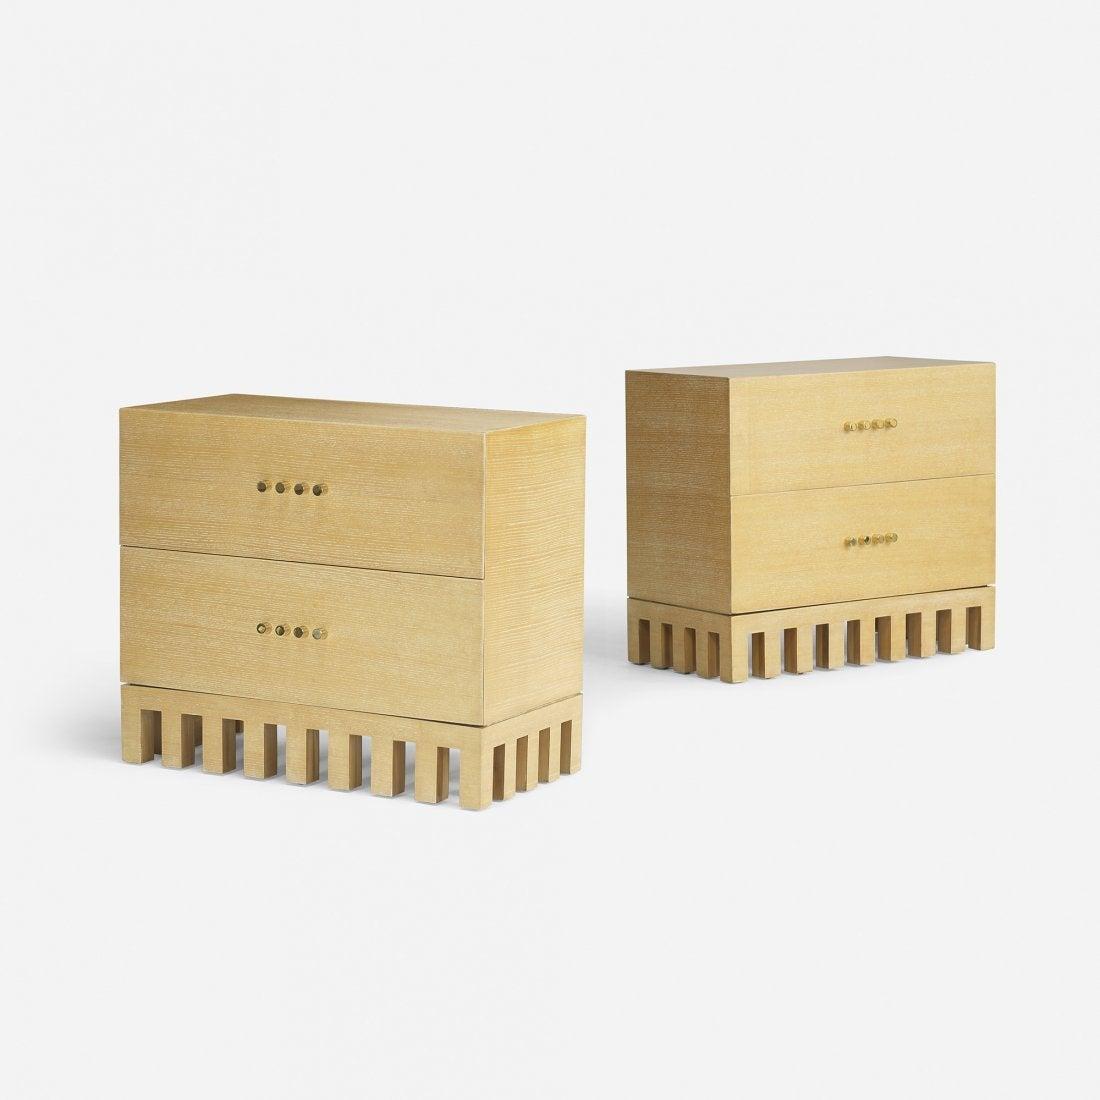 jean michel wilmotte commodes at 1stdibs. Black Bedroom Furniture Sets. Home Design Ideas